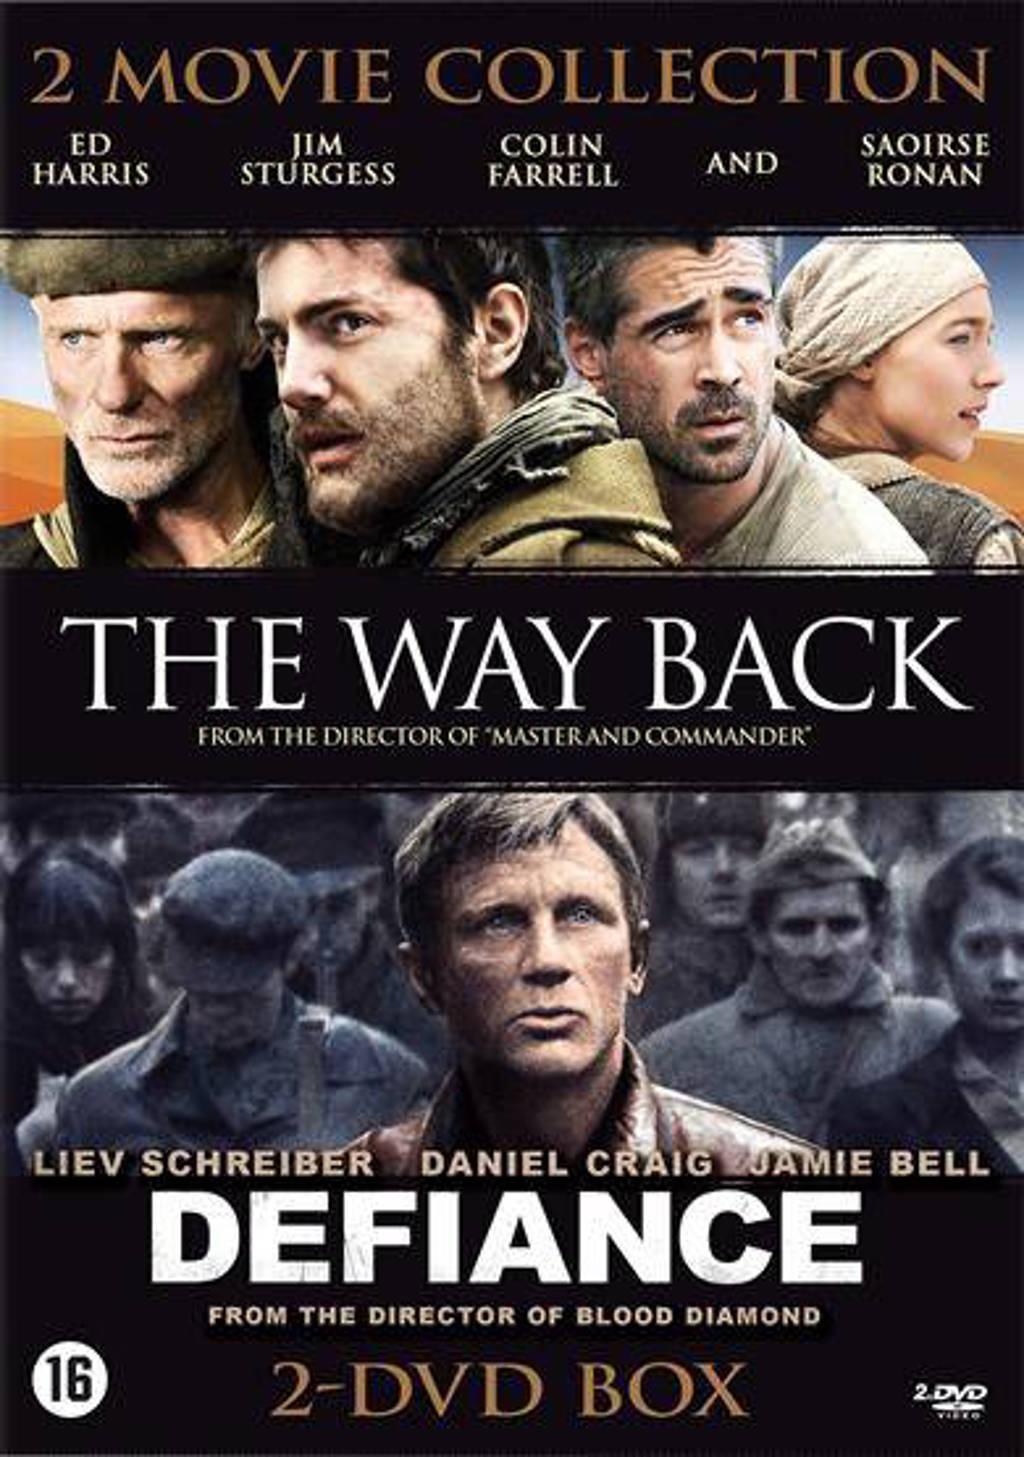 Defiance/Way back (DVD)